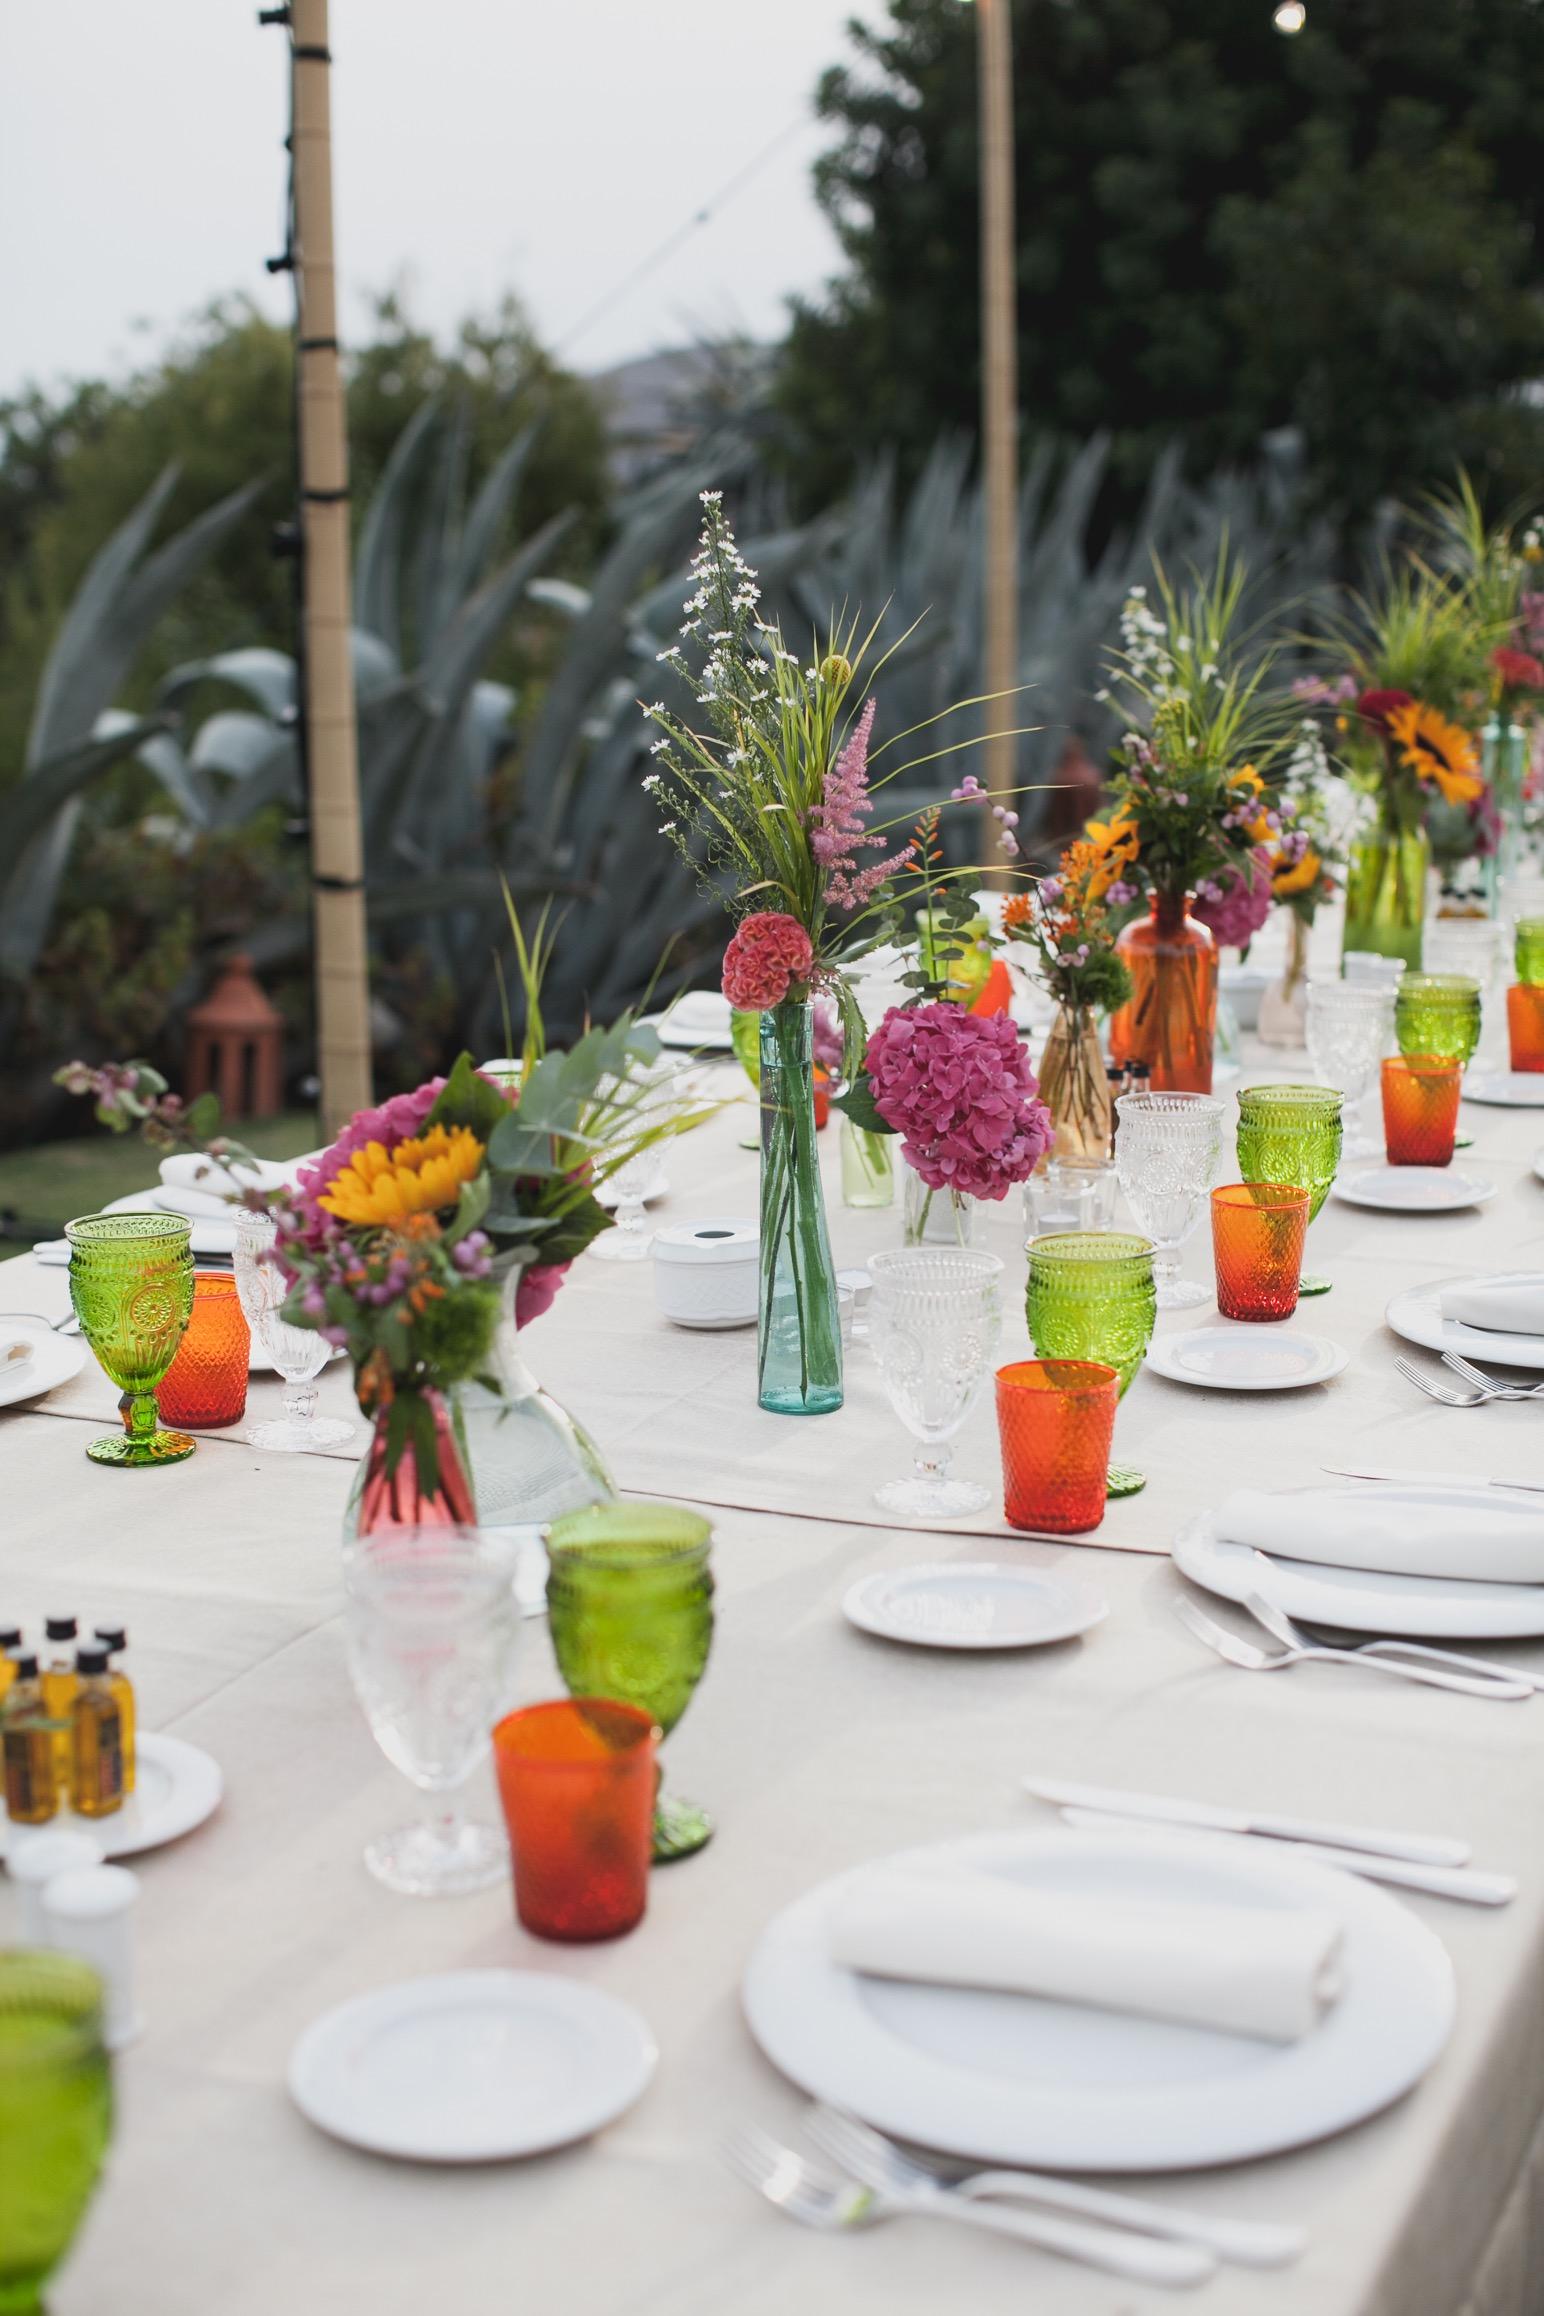 Si-Quiero-Wedding-Planner-By-Sira-Antequera-Bodas-Málaga-Marbella-Miami- PATRICIA-JUANLU-002